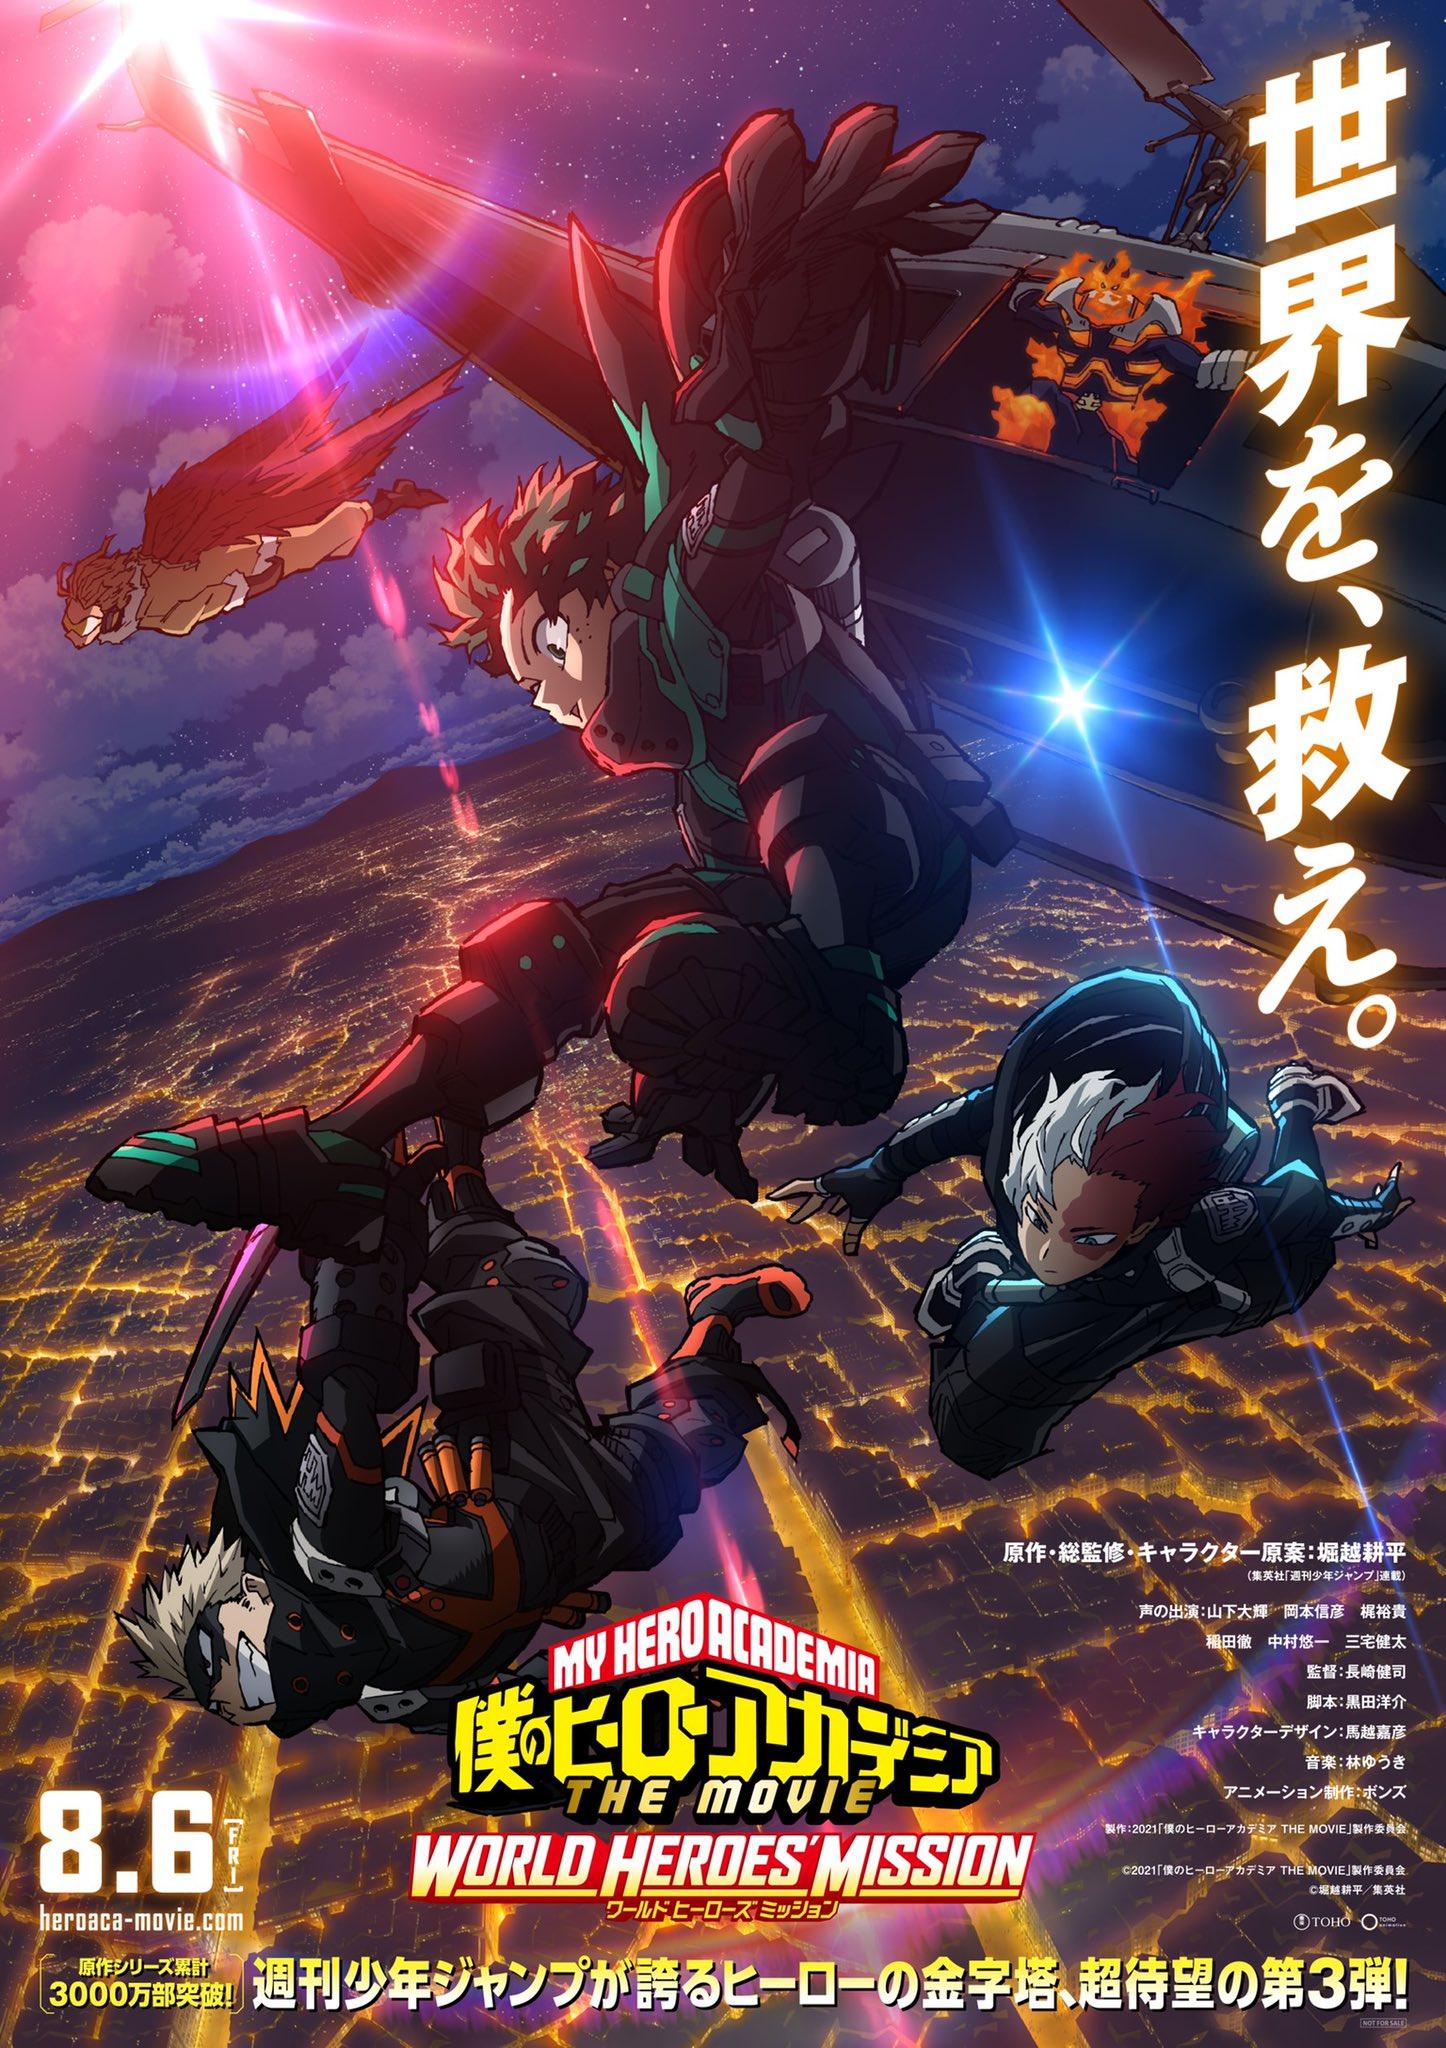 My Hero Academia THE MOVIE: World Heroes Mission